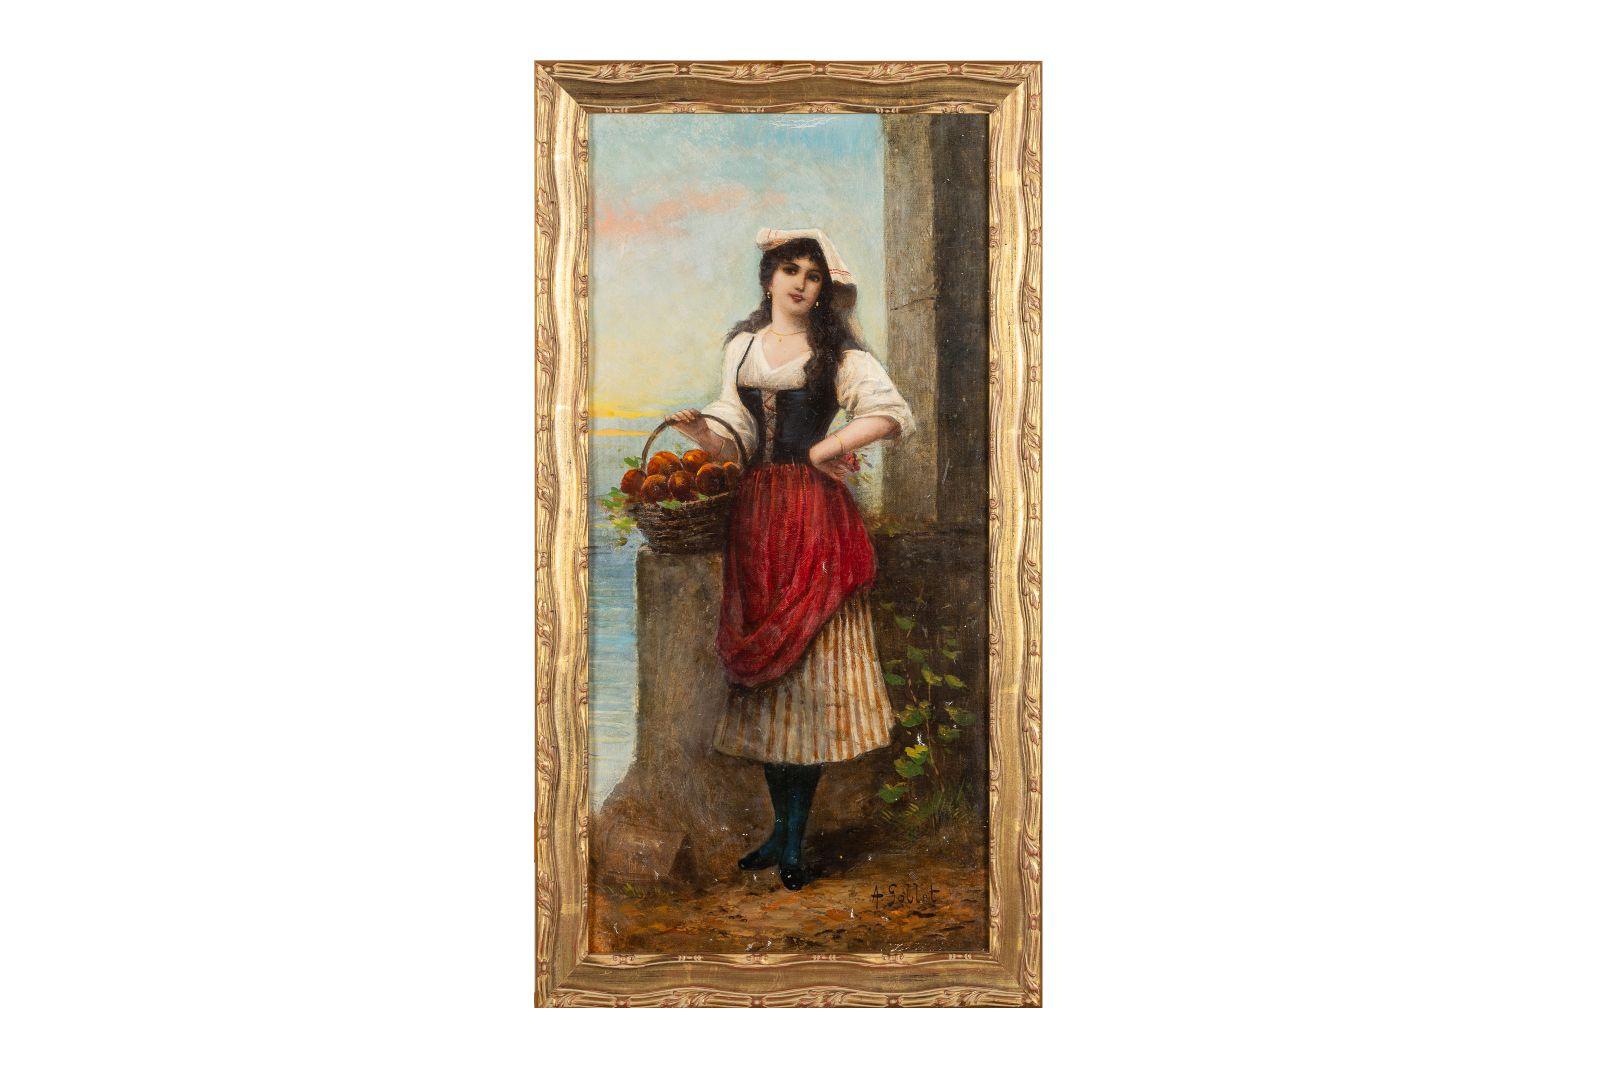 "#161 A. Goblet, ""Italian peach seller"" | A. Goblet, "" Italienische Pfirsichverkäuferin"" Image"